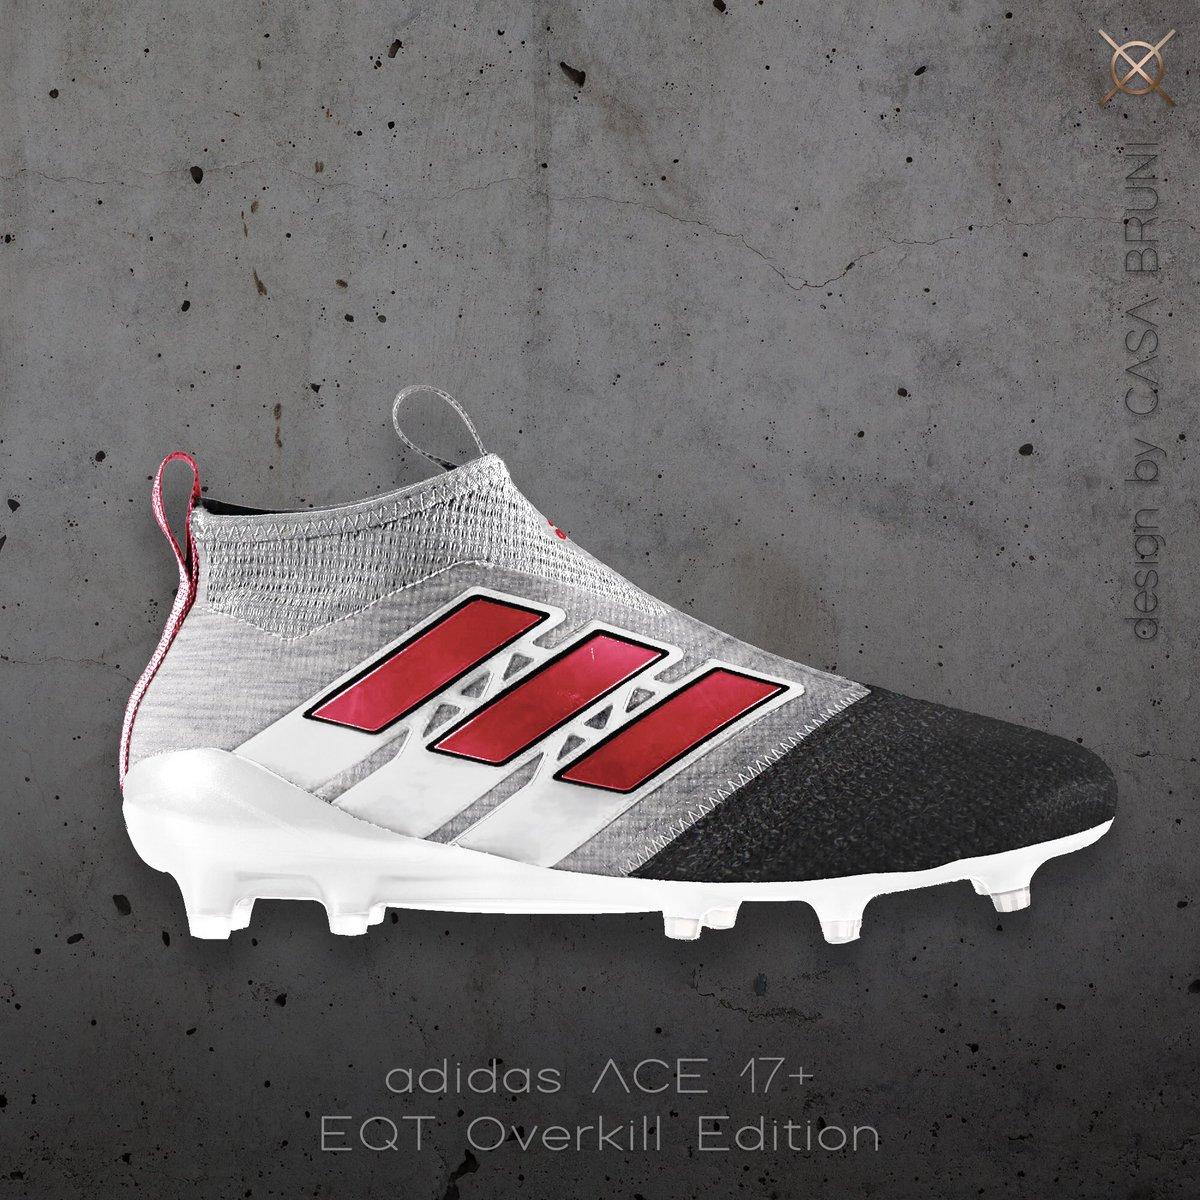 Adidas ACE 17+ /// EQT Overkill Edition  #HereToCreate #NeverFollow #adidasfootball #adidasACE<br>http://pic.twitter.com/UAucMXCNZe